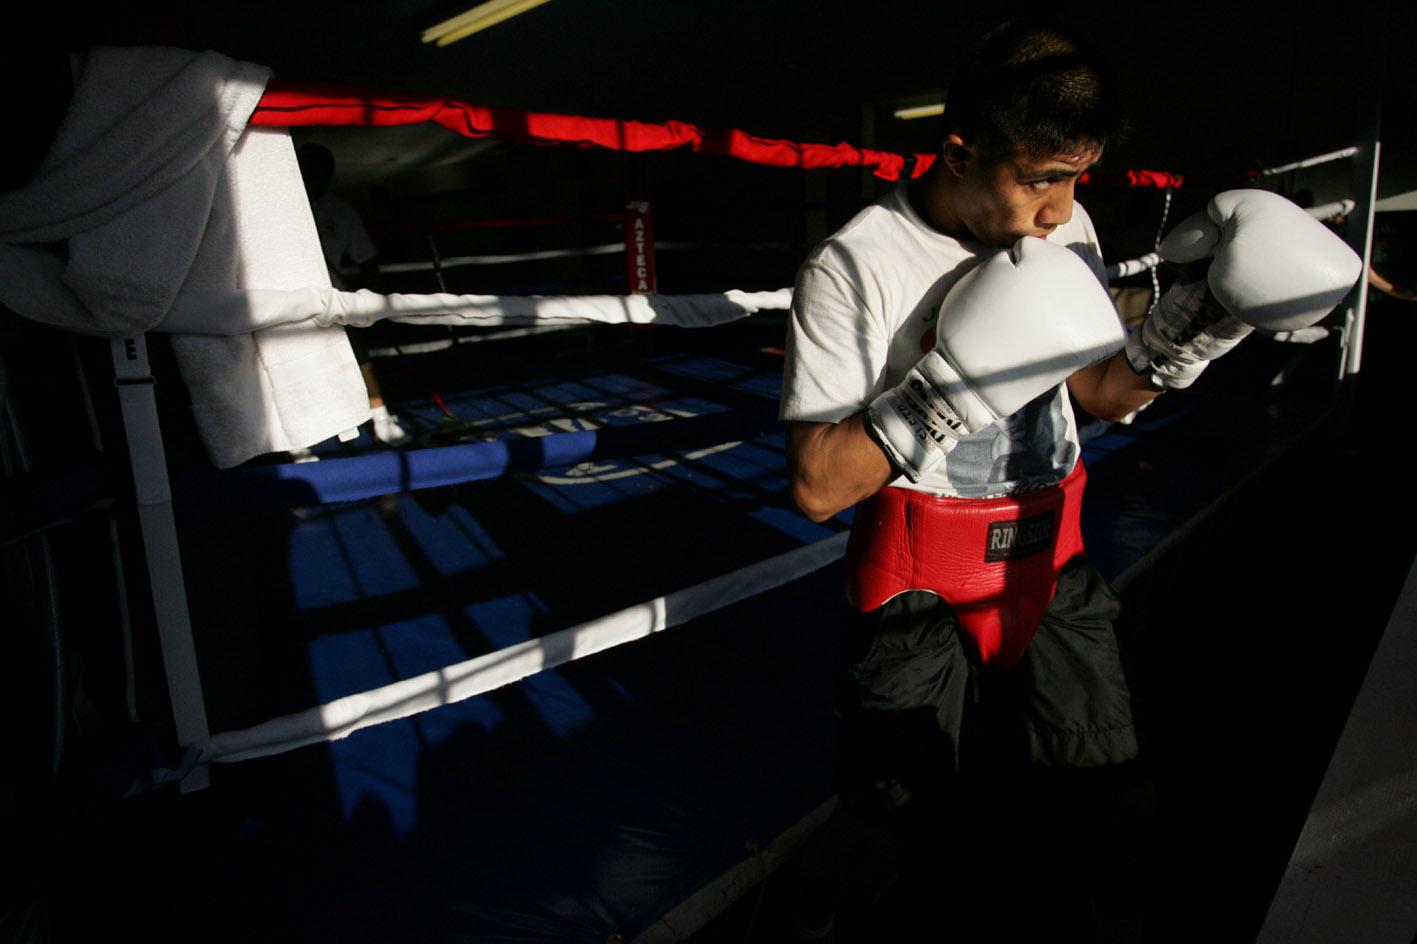 b_boxer5.jpg